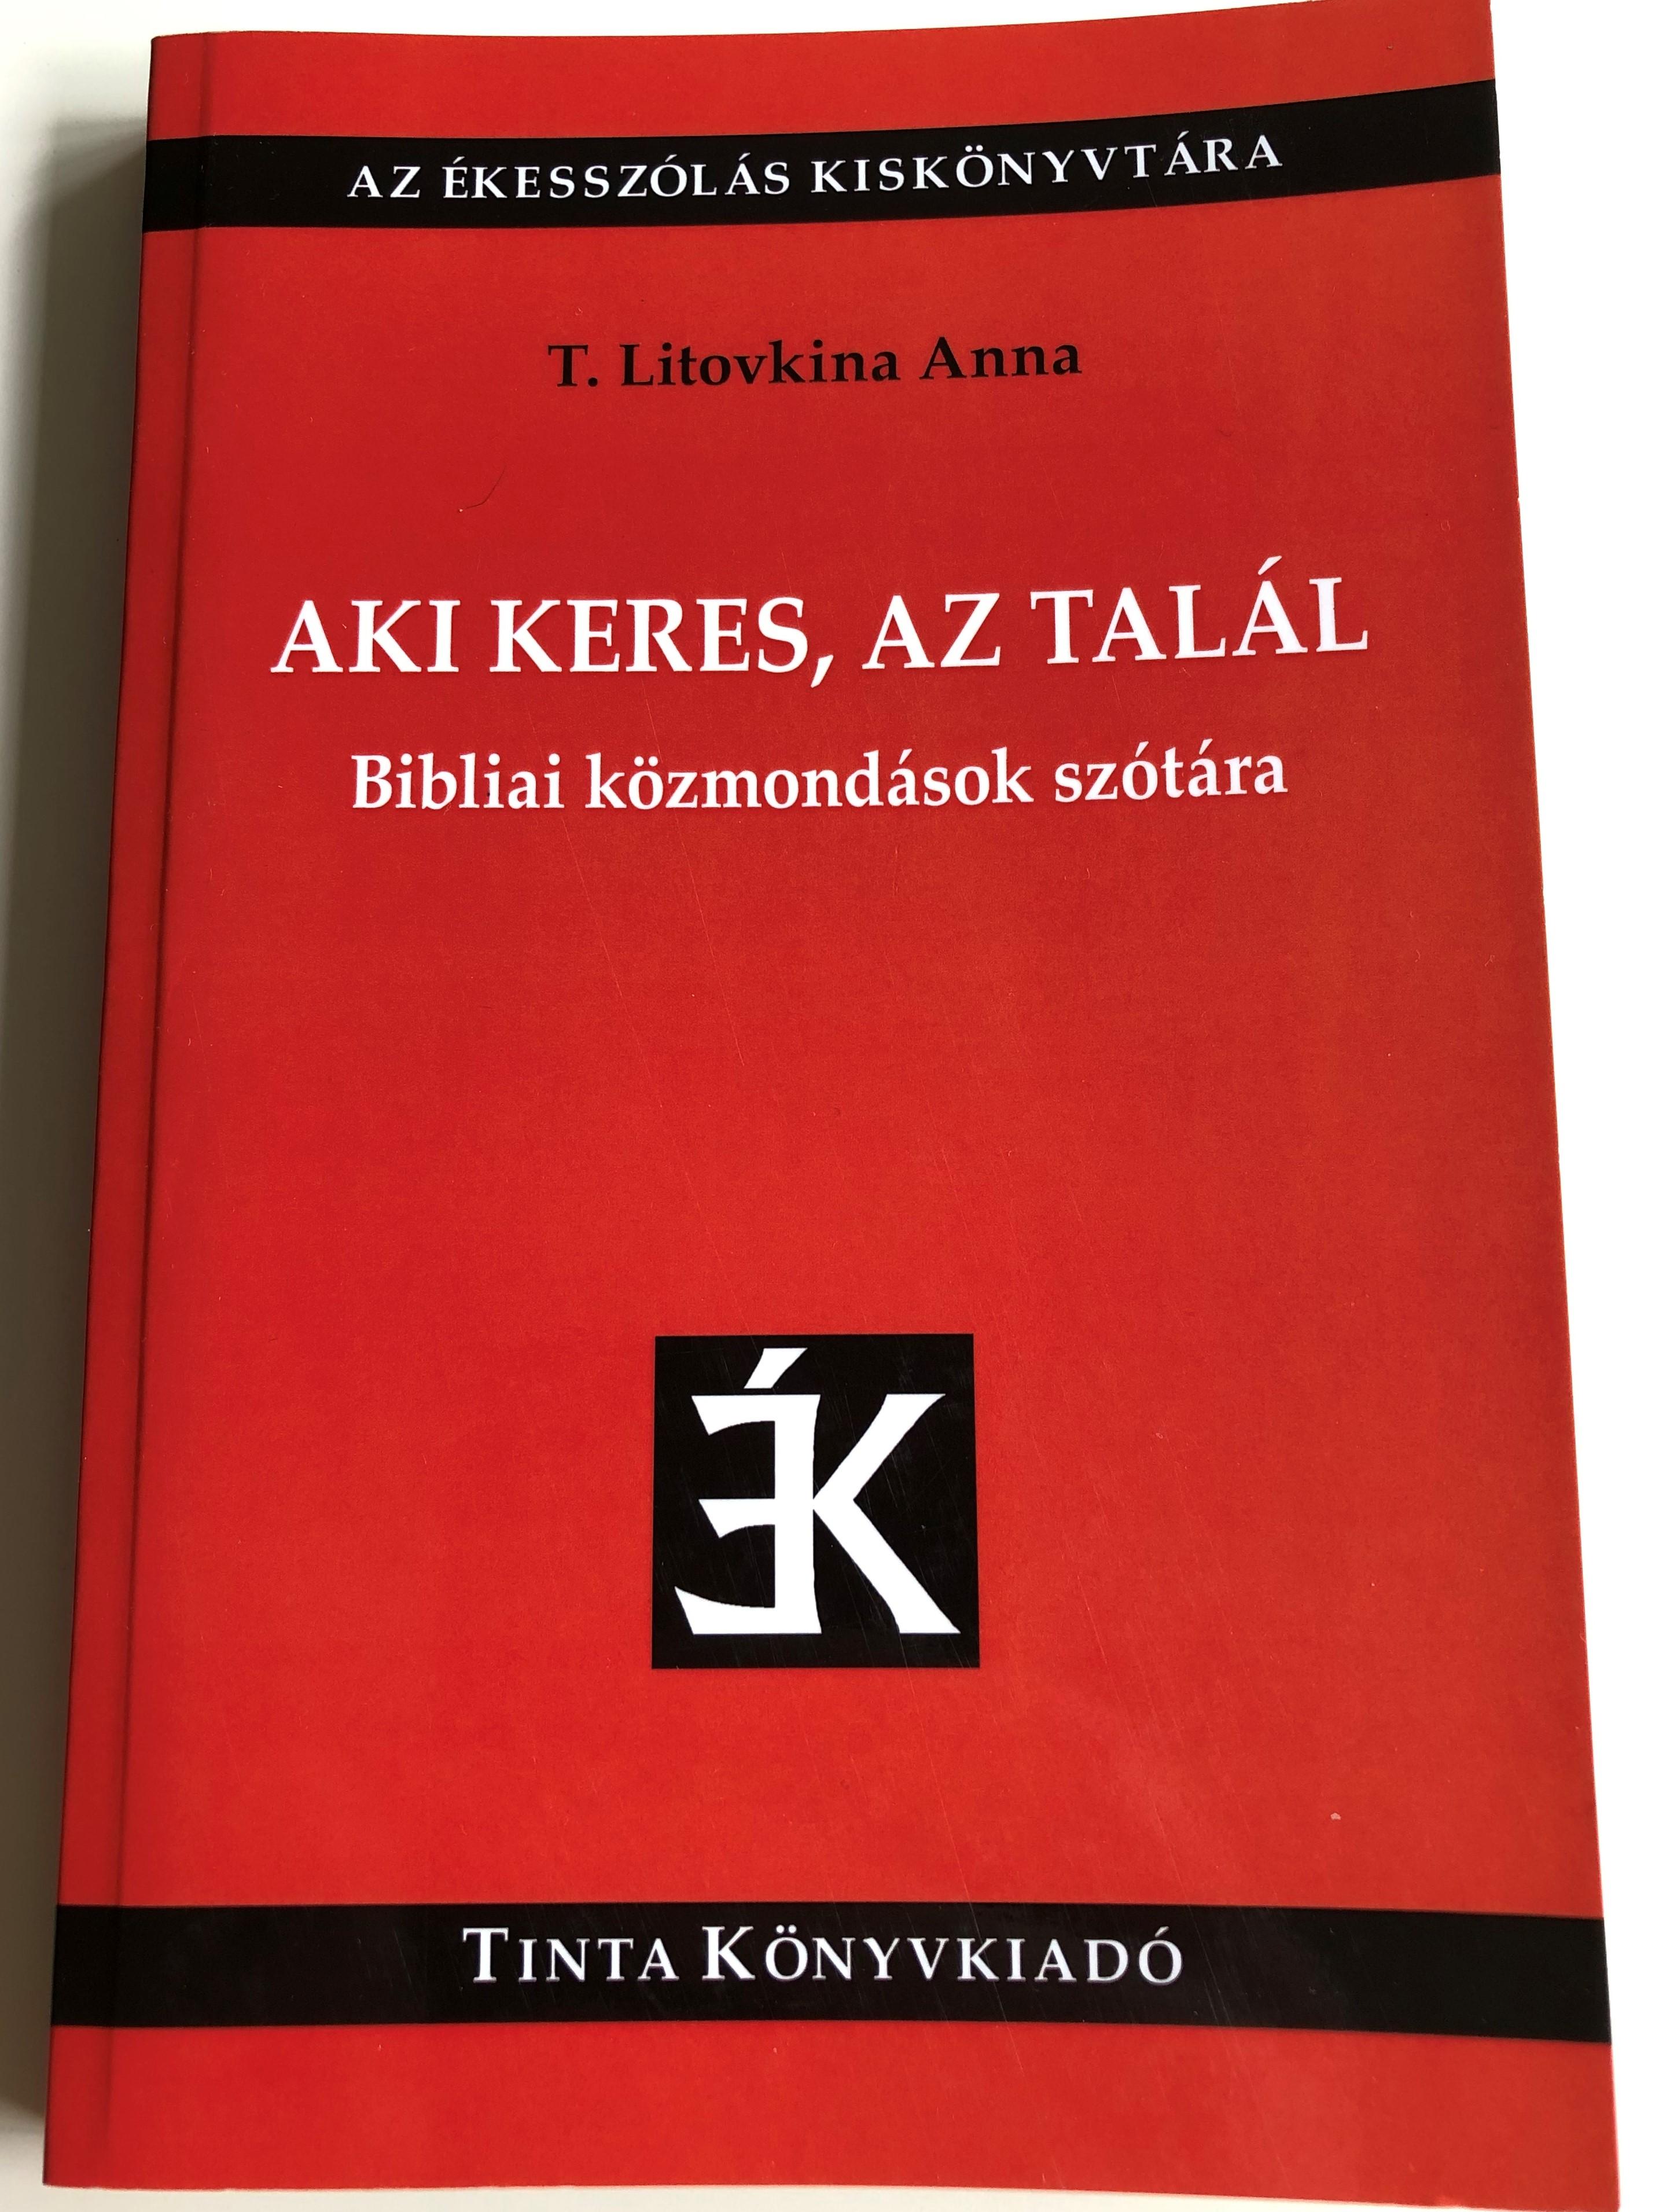 aki-keres-az-tal-l-bibliai-k-zmond-sok-sz-t-ra-by-t.-litovkina-anna-seek-and-ye-shall-find-hungarian-language-dictionary-of-biblical-sayings-and-phrases-tinta-k-nyvkiad-az-kessz-l-s-kisk-nyvt-ra-1-.jpg